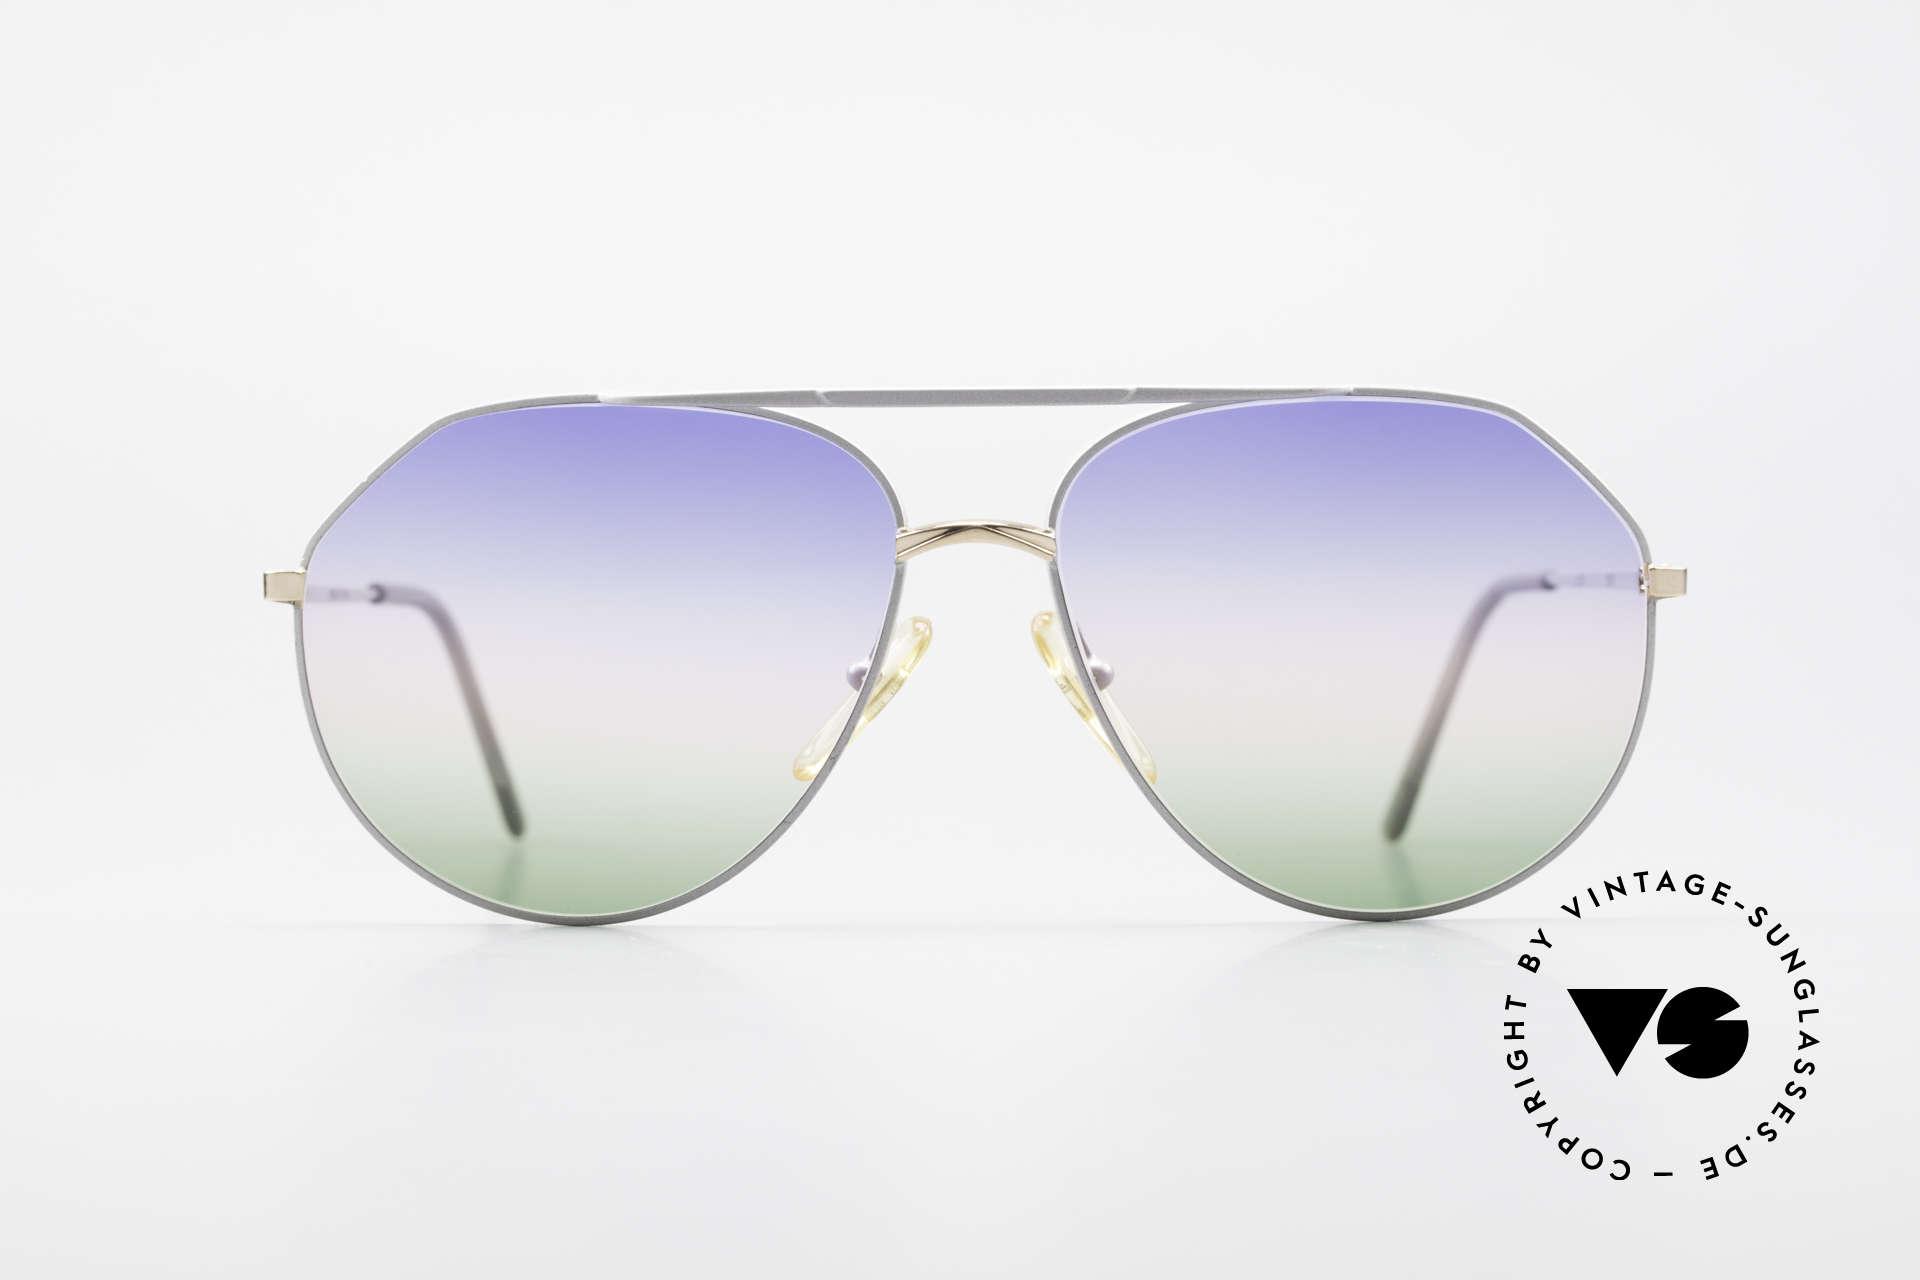 Casanova 6052 Titanium Aviator Sunglasses, titanium frame with gold-plated bridge and hinges, Made for Men and Women